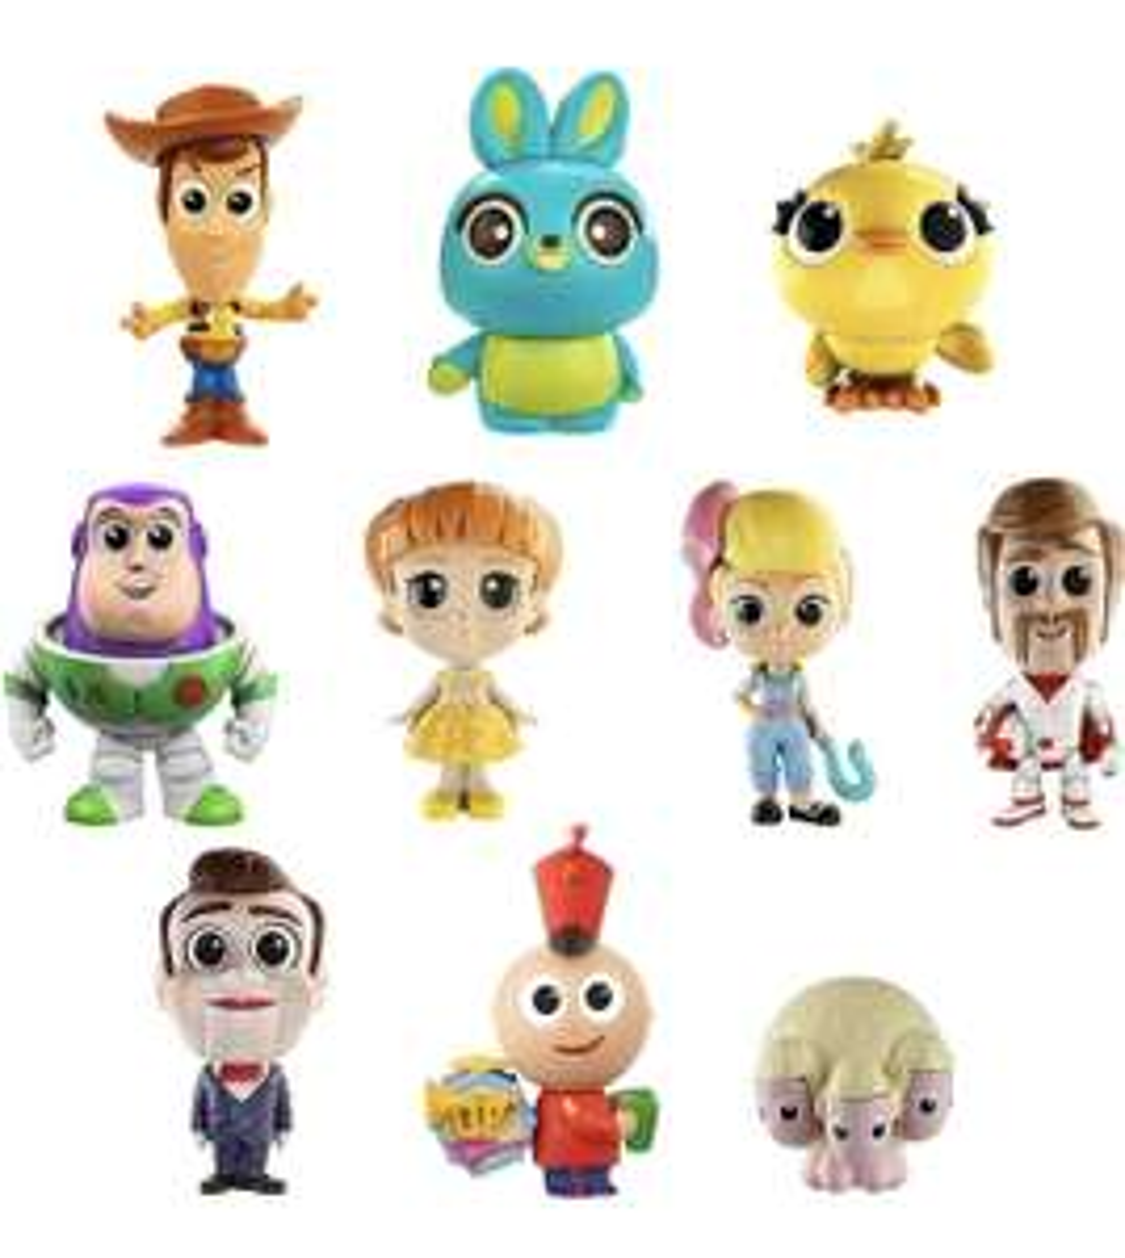 Pack de 10 Mini-Figurines Toy Story 4